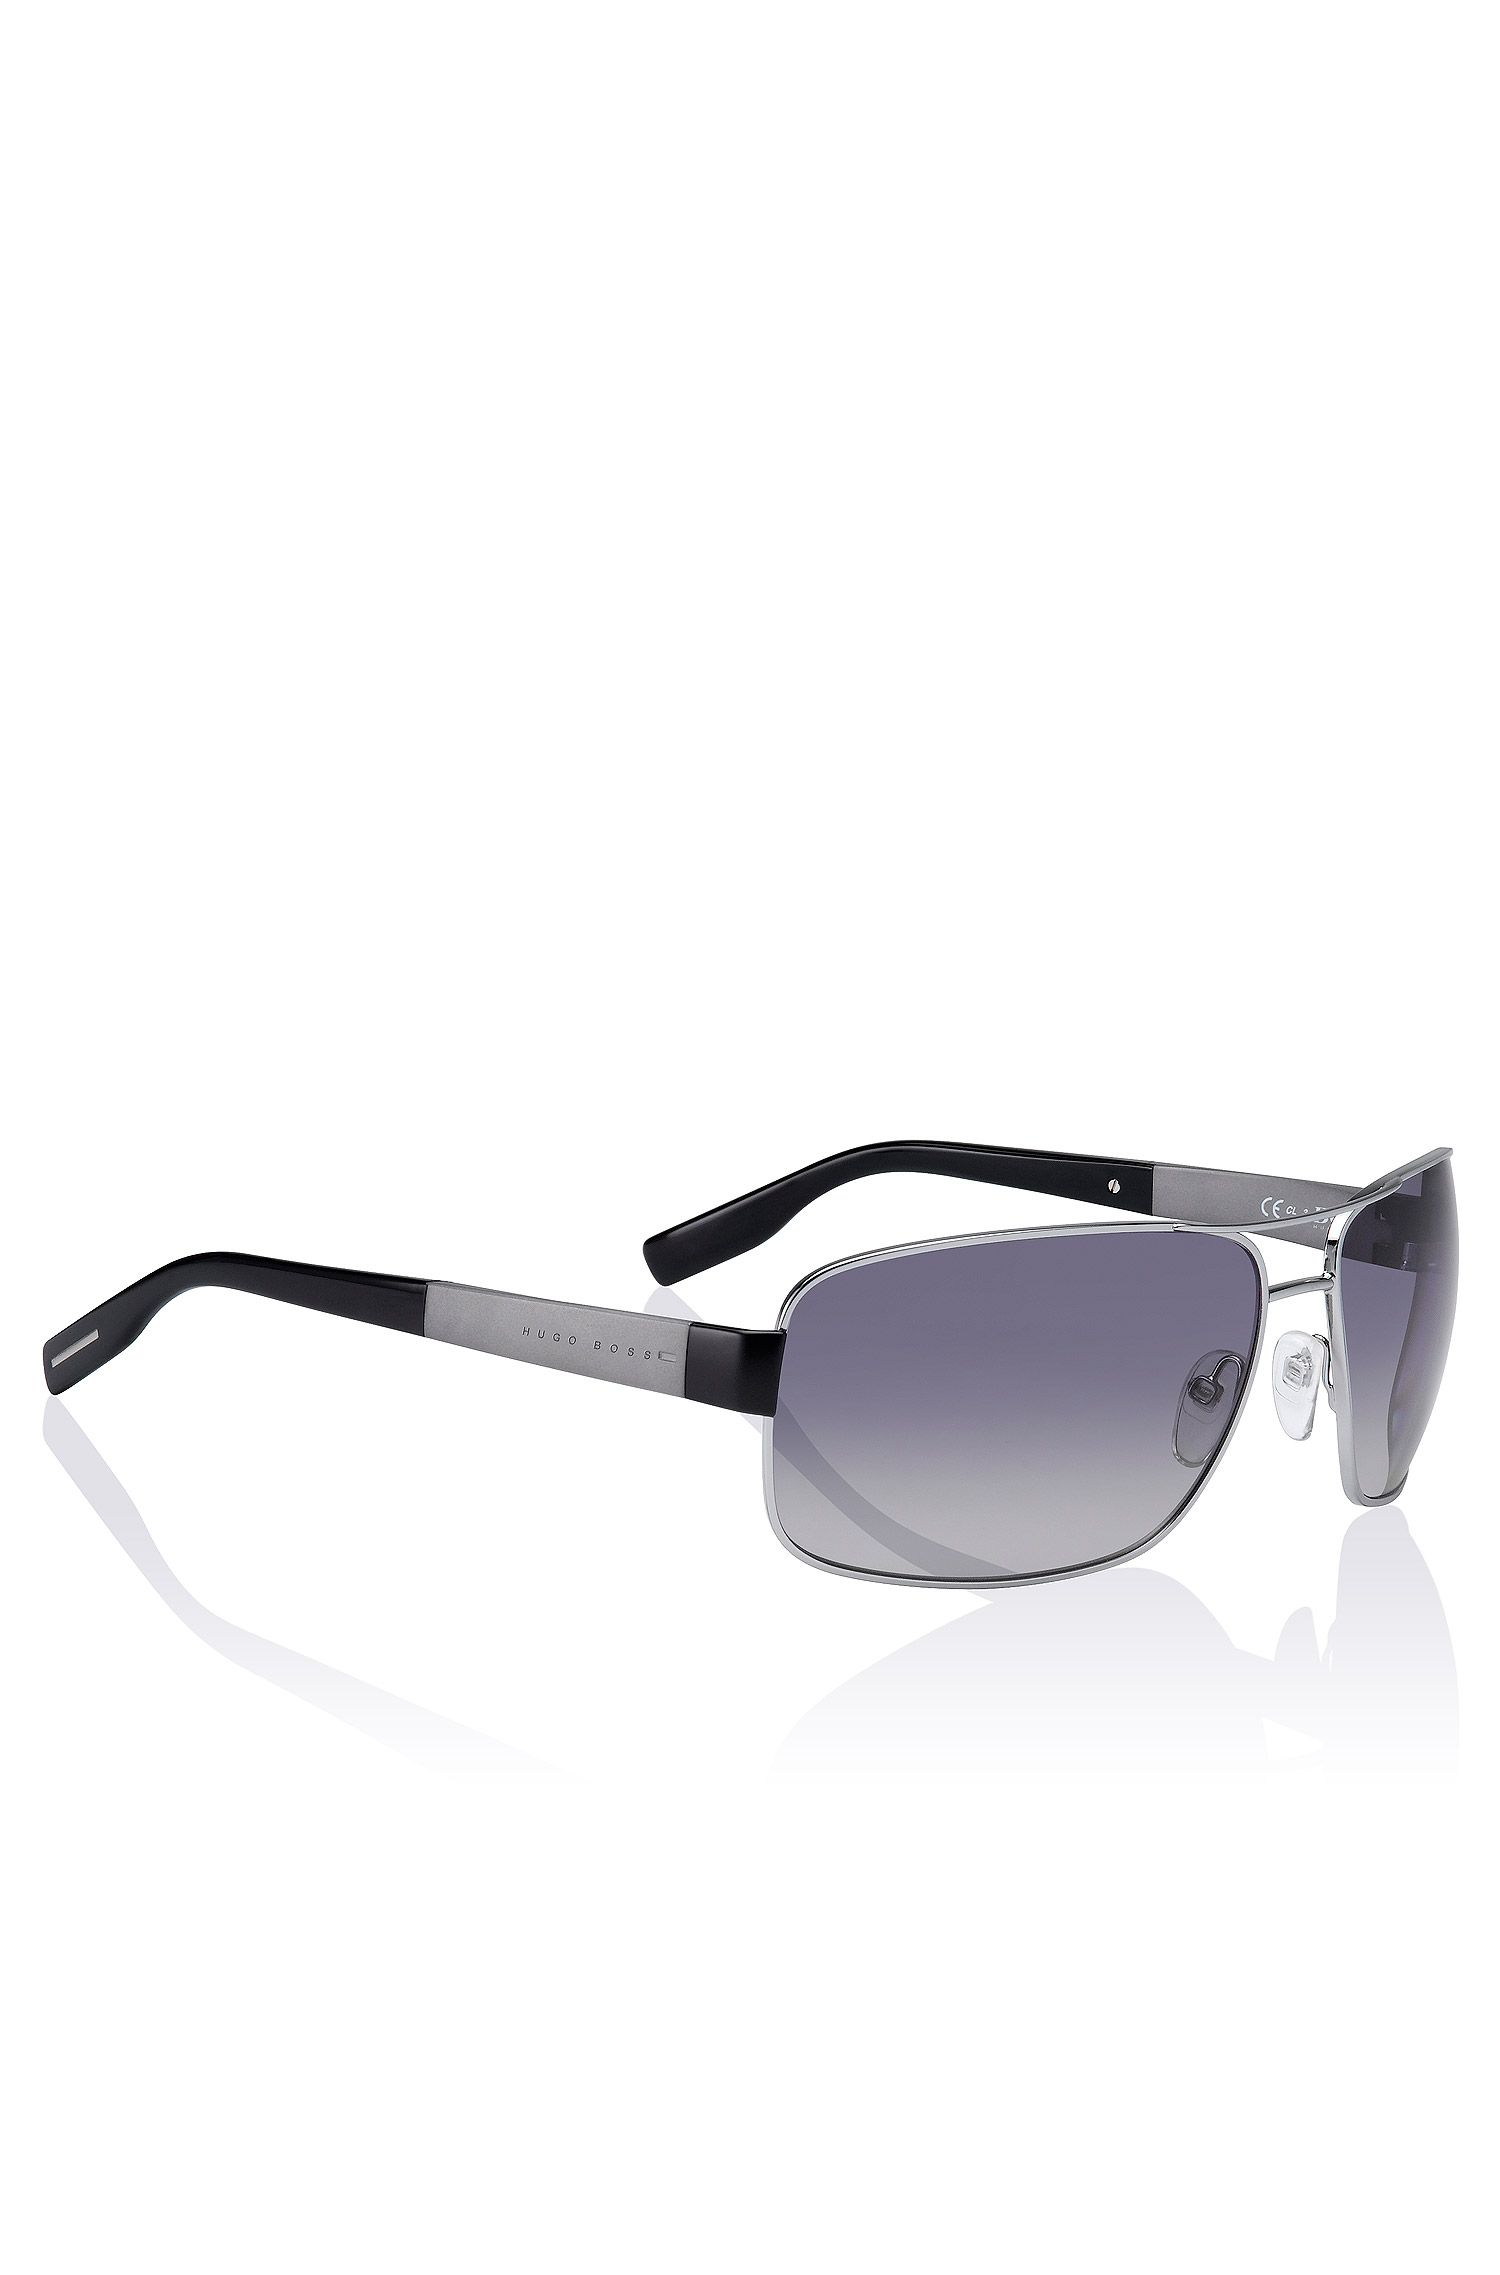 Sportliche Sonnenbrille ´BOSS 0521/S`